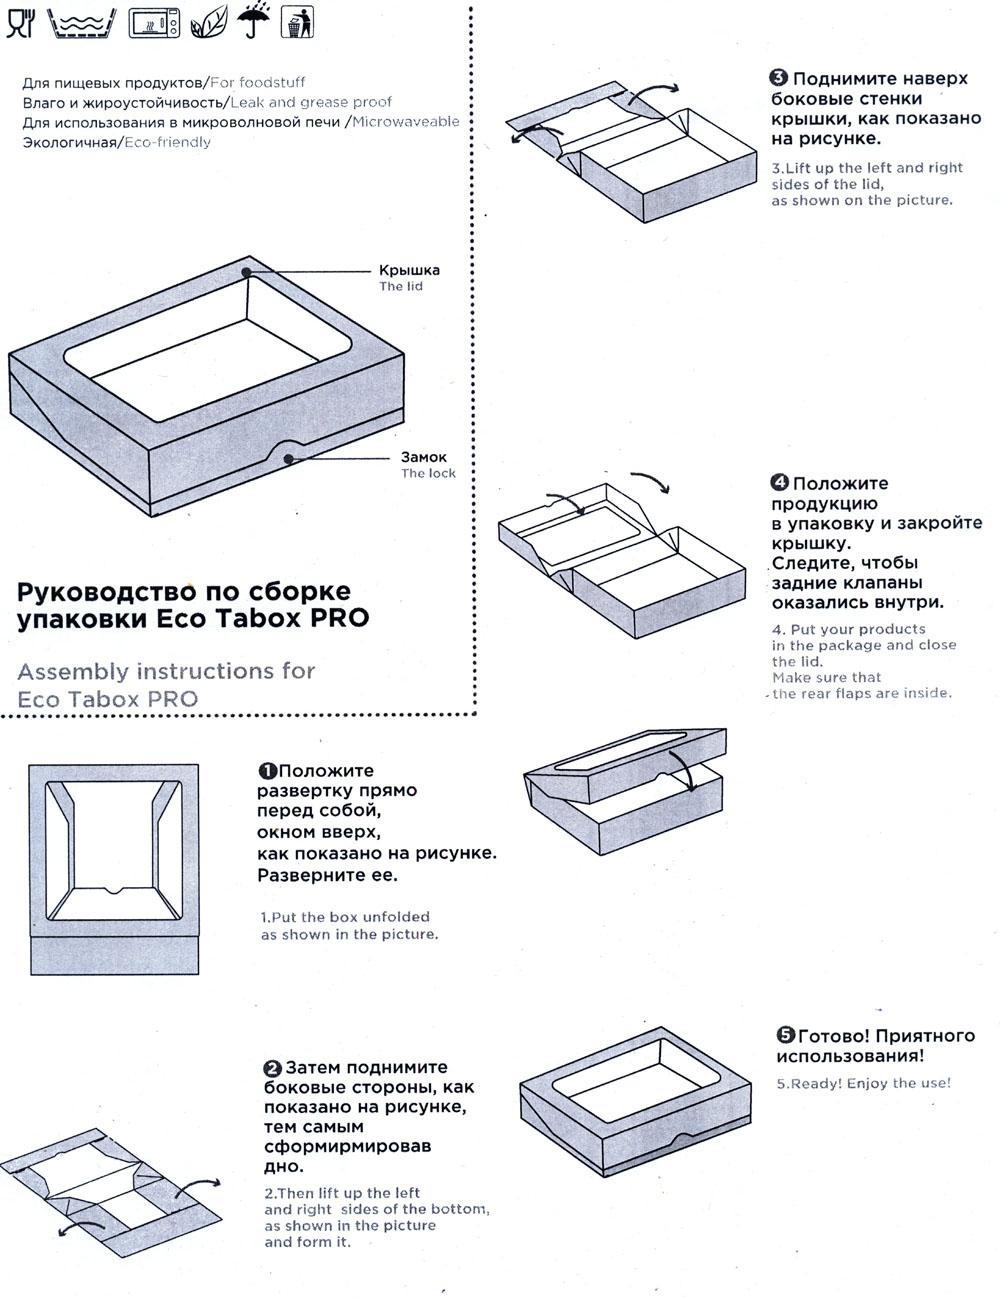 Инструкция по сбору коробки ECO TABOX